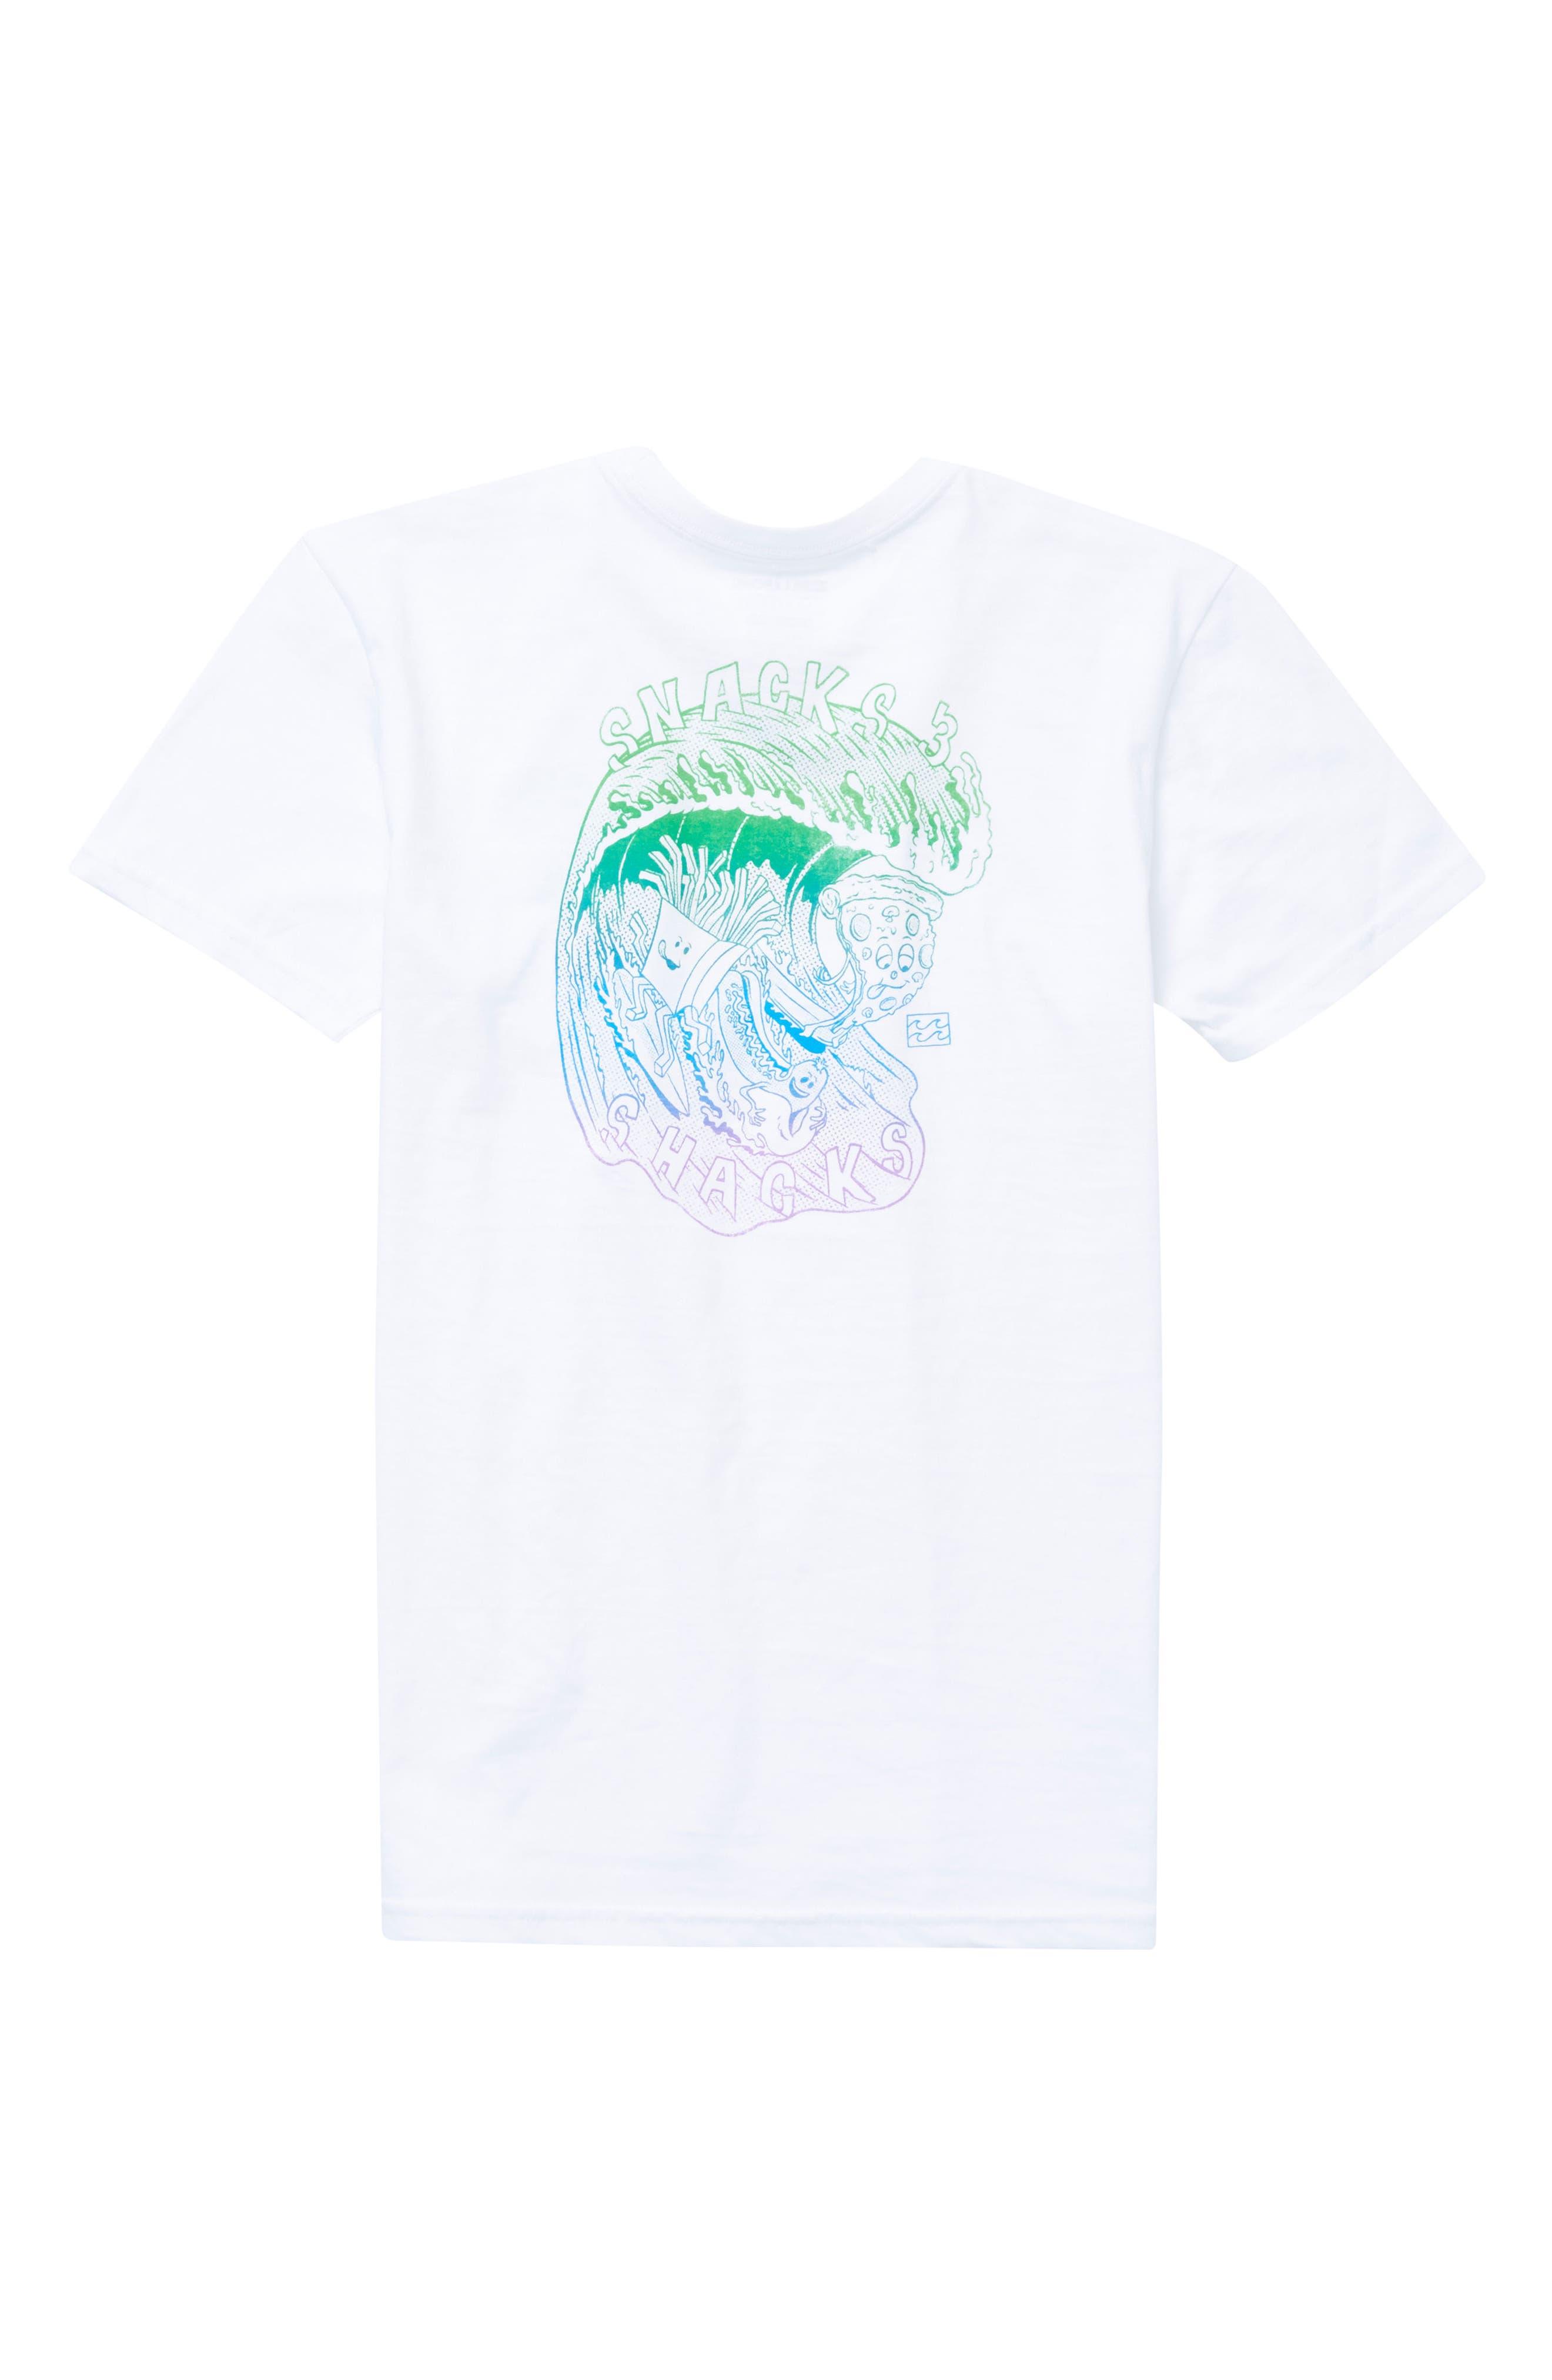 Snacks & Shacks Graphic T-Shirt,                             Alternate thumbnail 5, color,